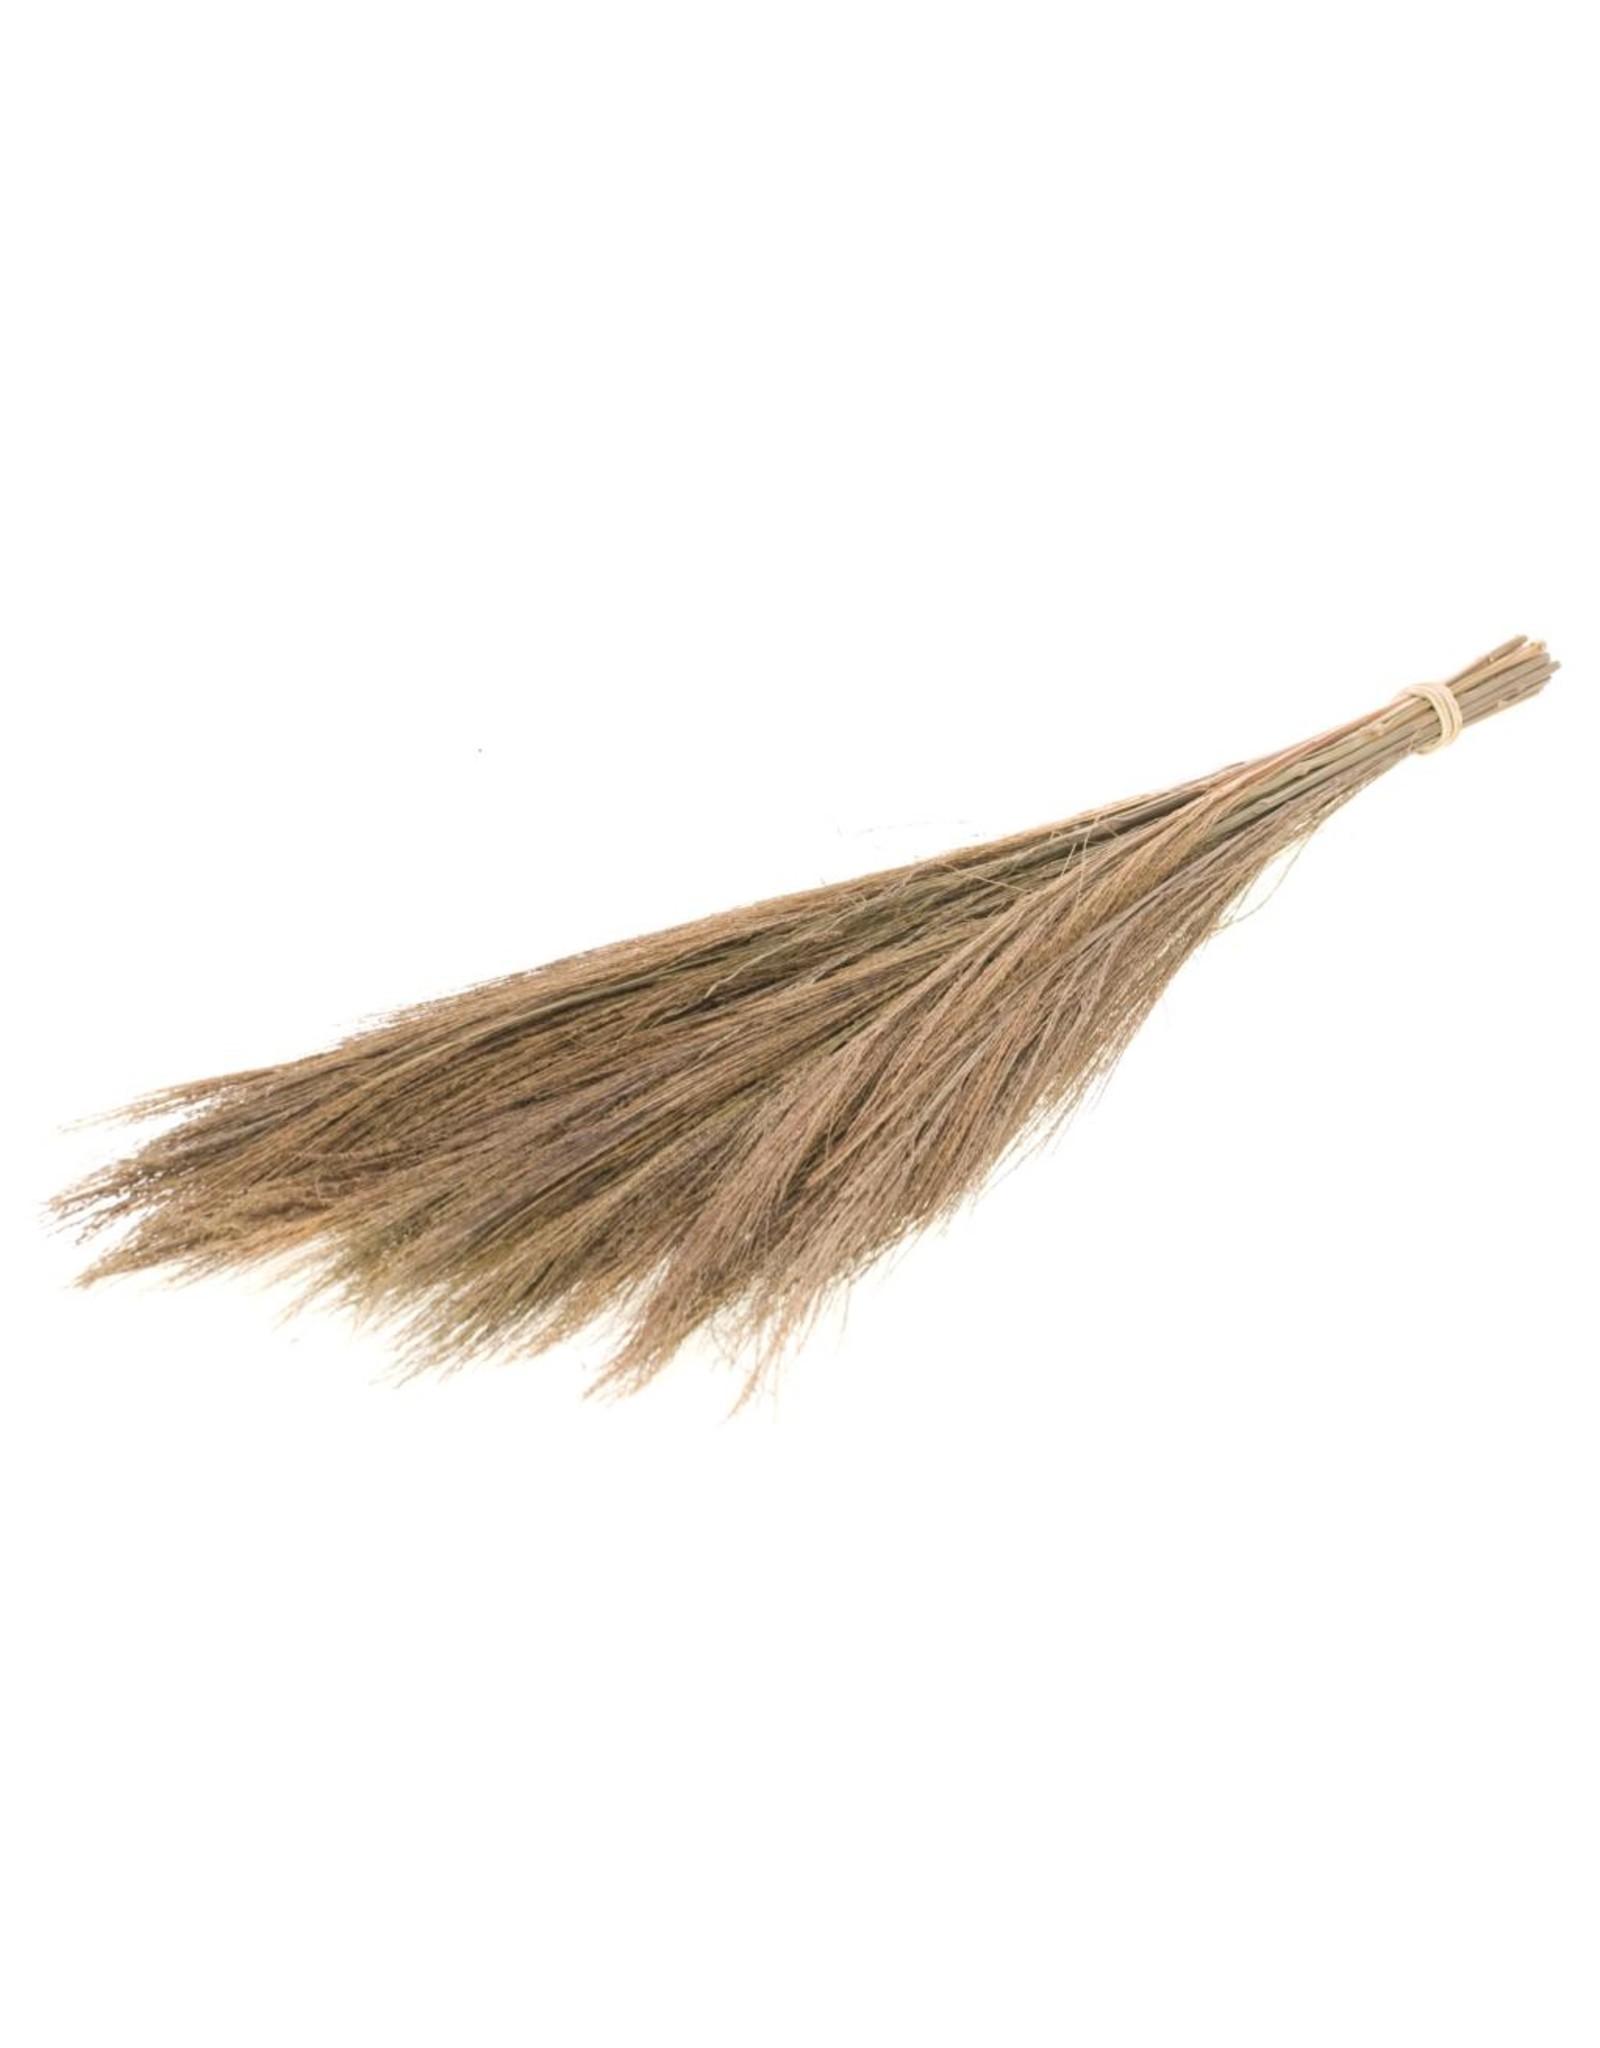 Broom grass 100gr 65cm natural x 36